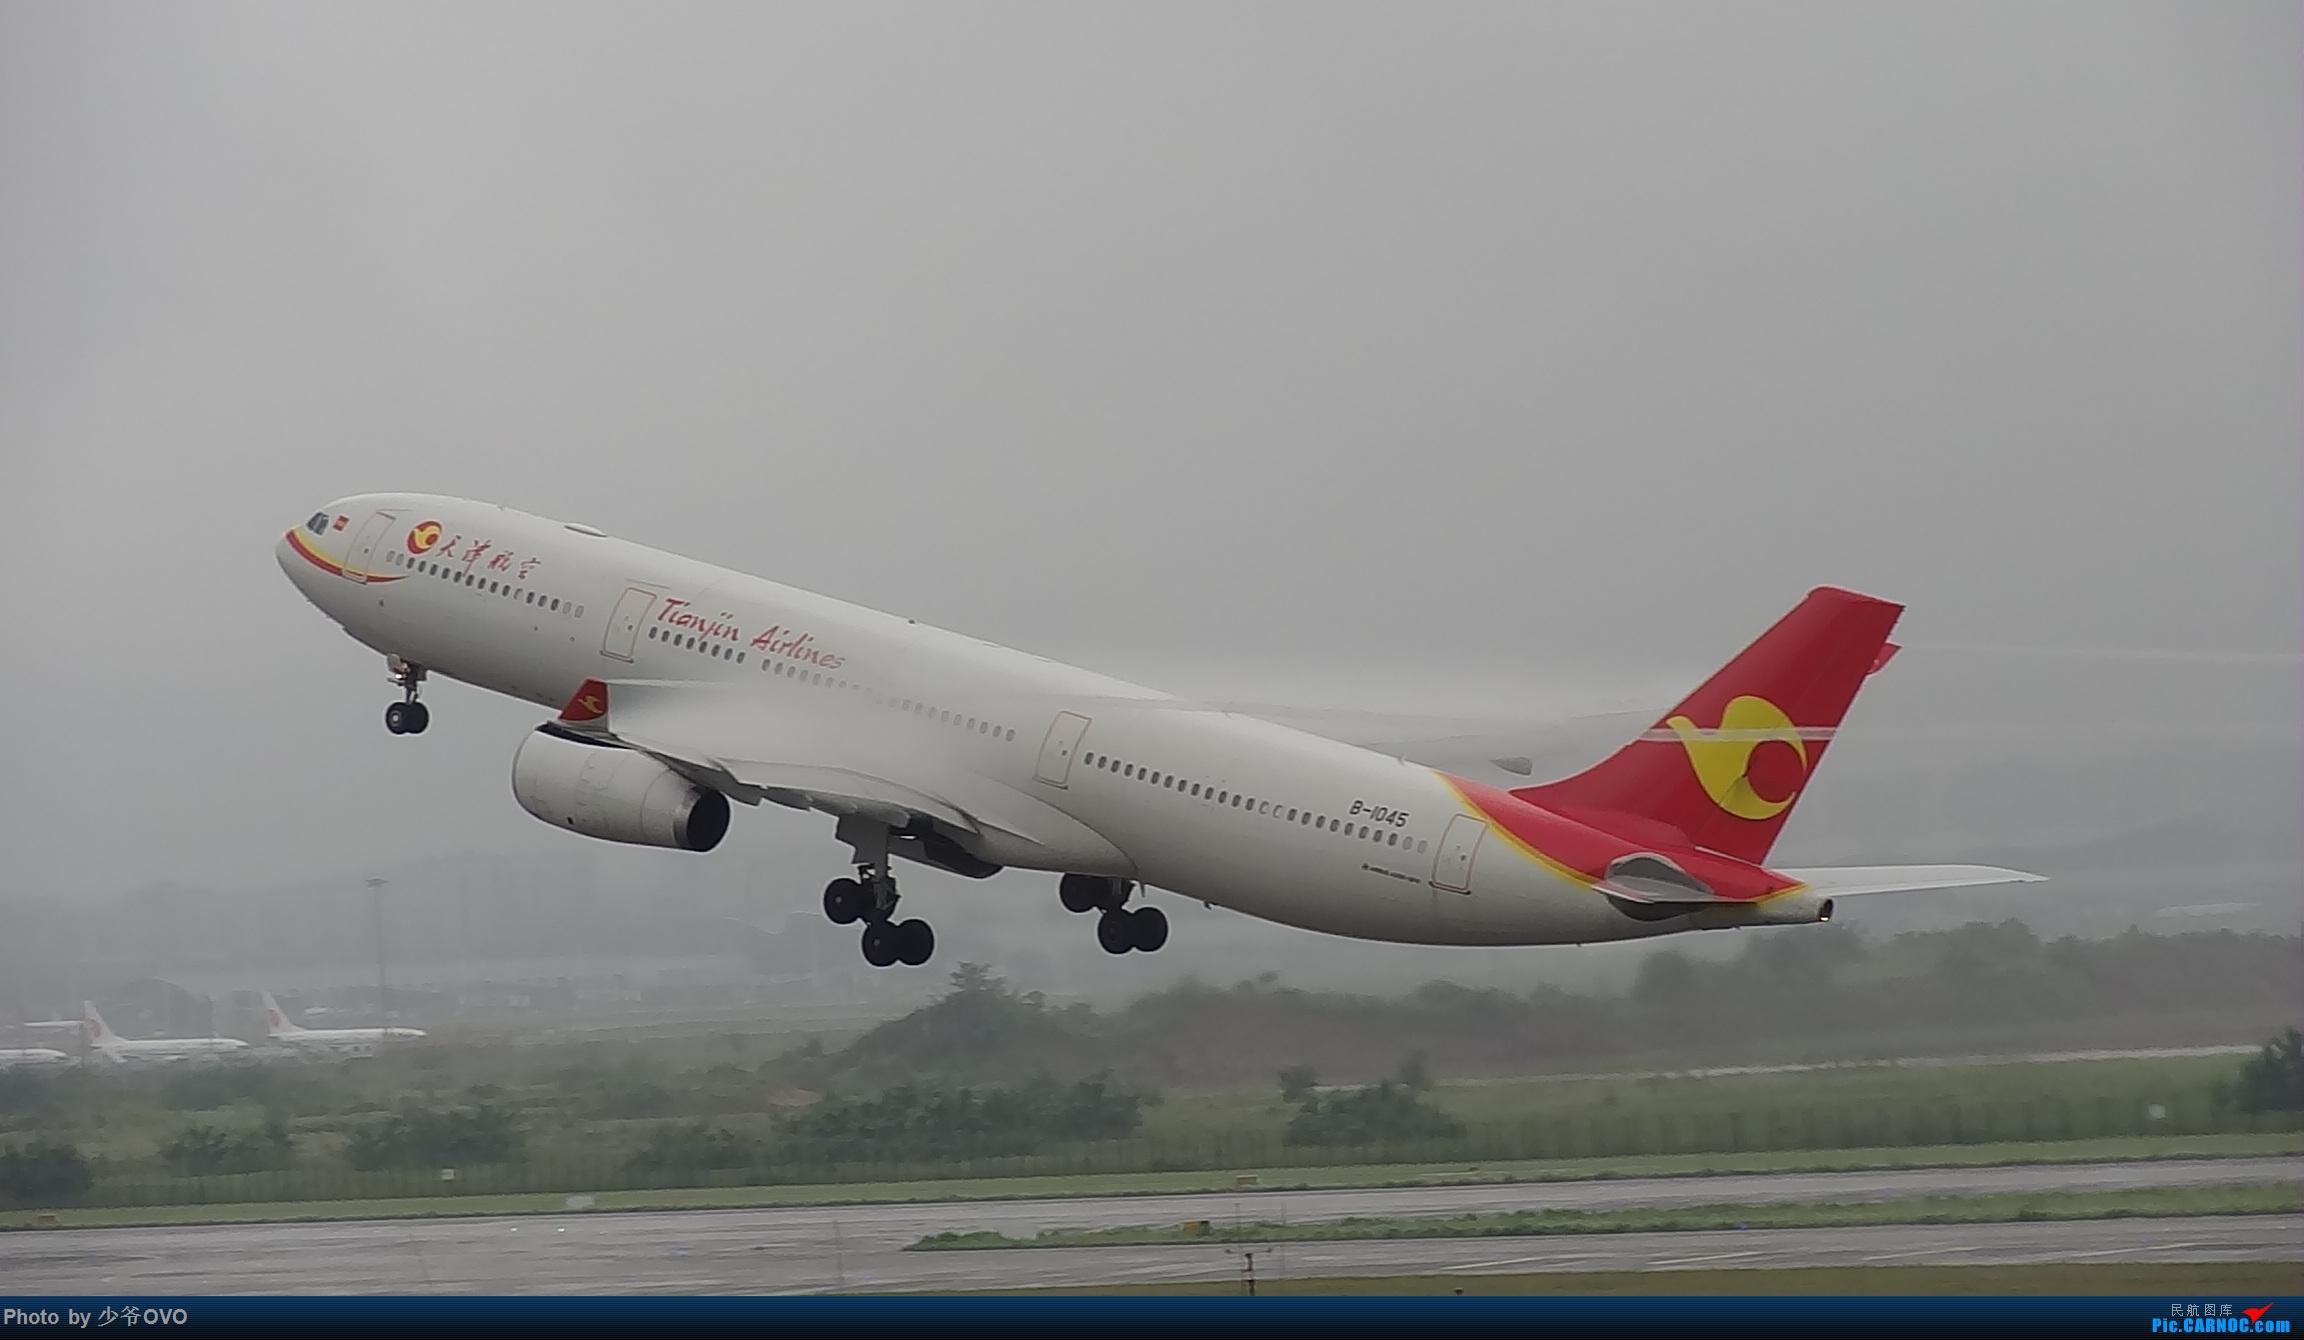 Re:[原创]CKG重庆江北机场拍机 ,中法建交50周年 AIRBUS A330-300 B-1045 中国重庆江北国际机场